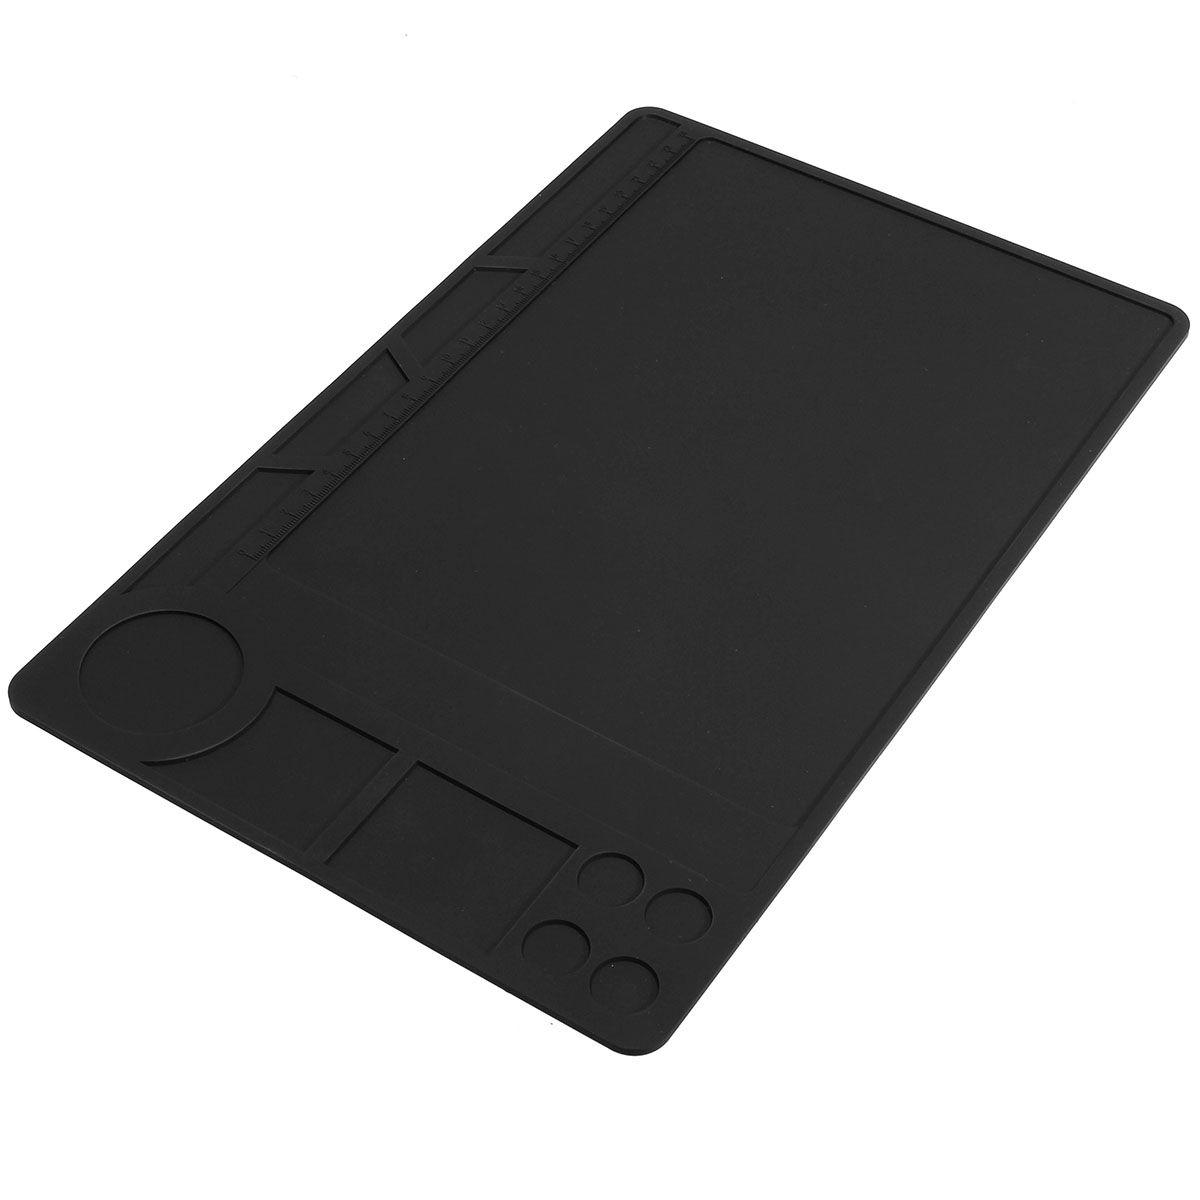 Heißer Verkauf Hitzebeständigem Silikon Matte Löten Pad Plattform Wärme BGA Lötstation Reparatur 329x208mm Schwarz